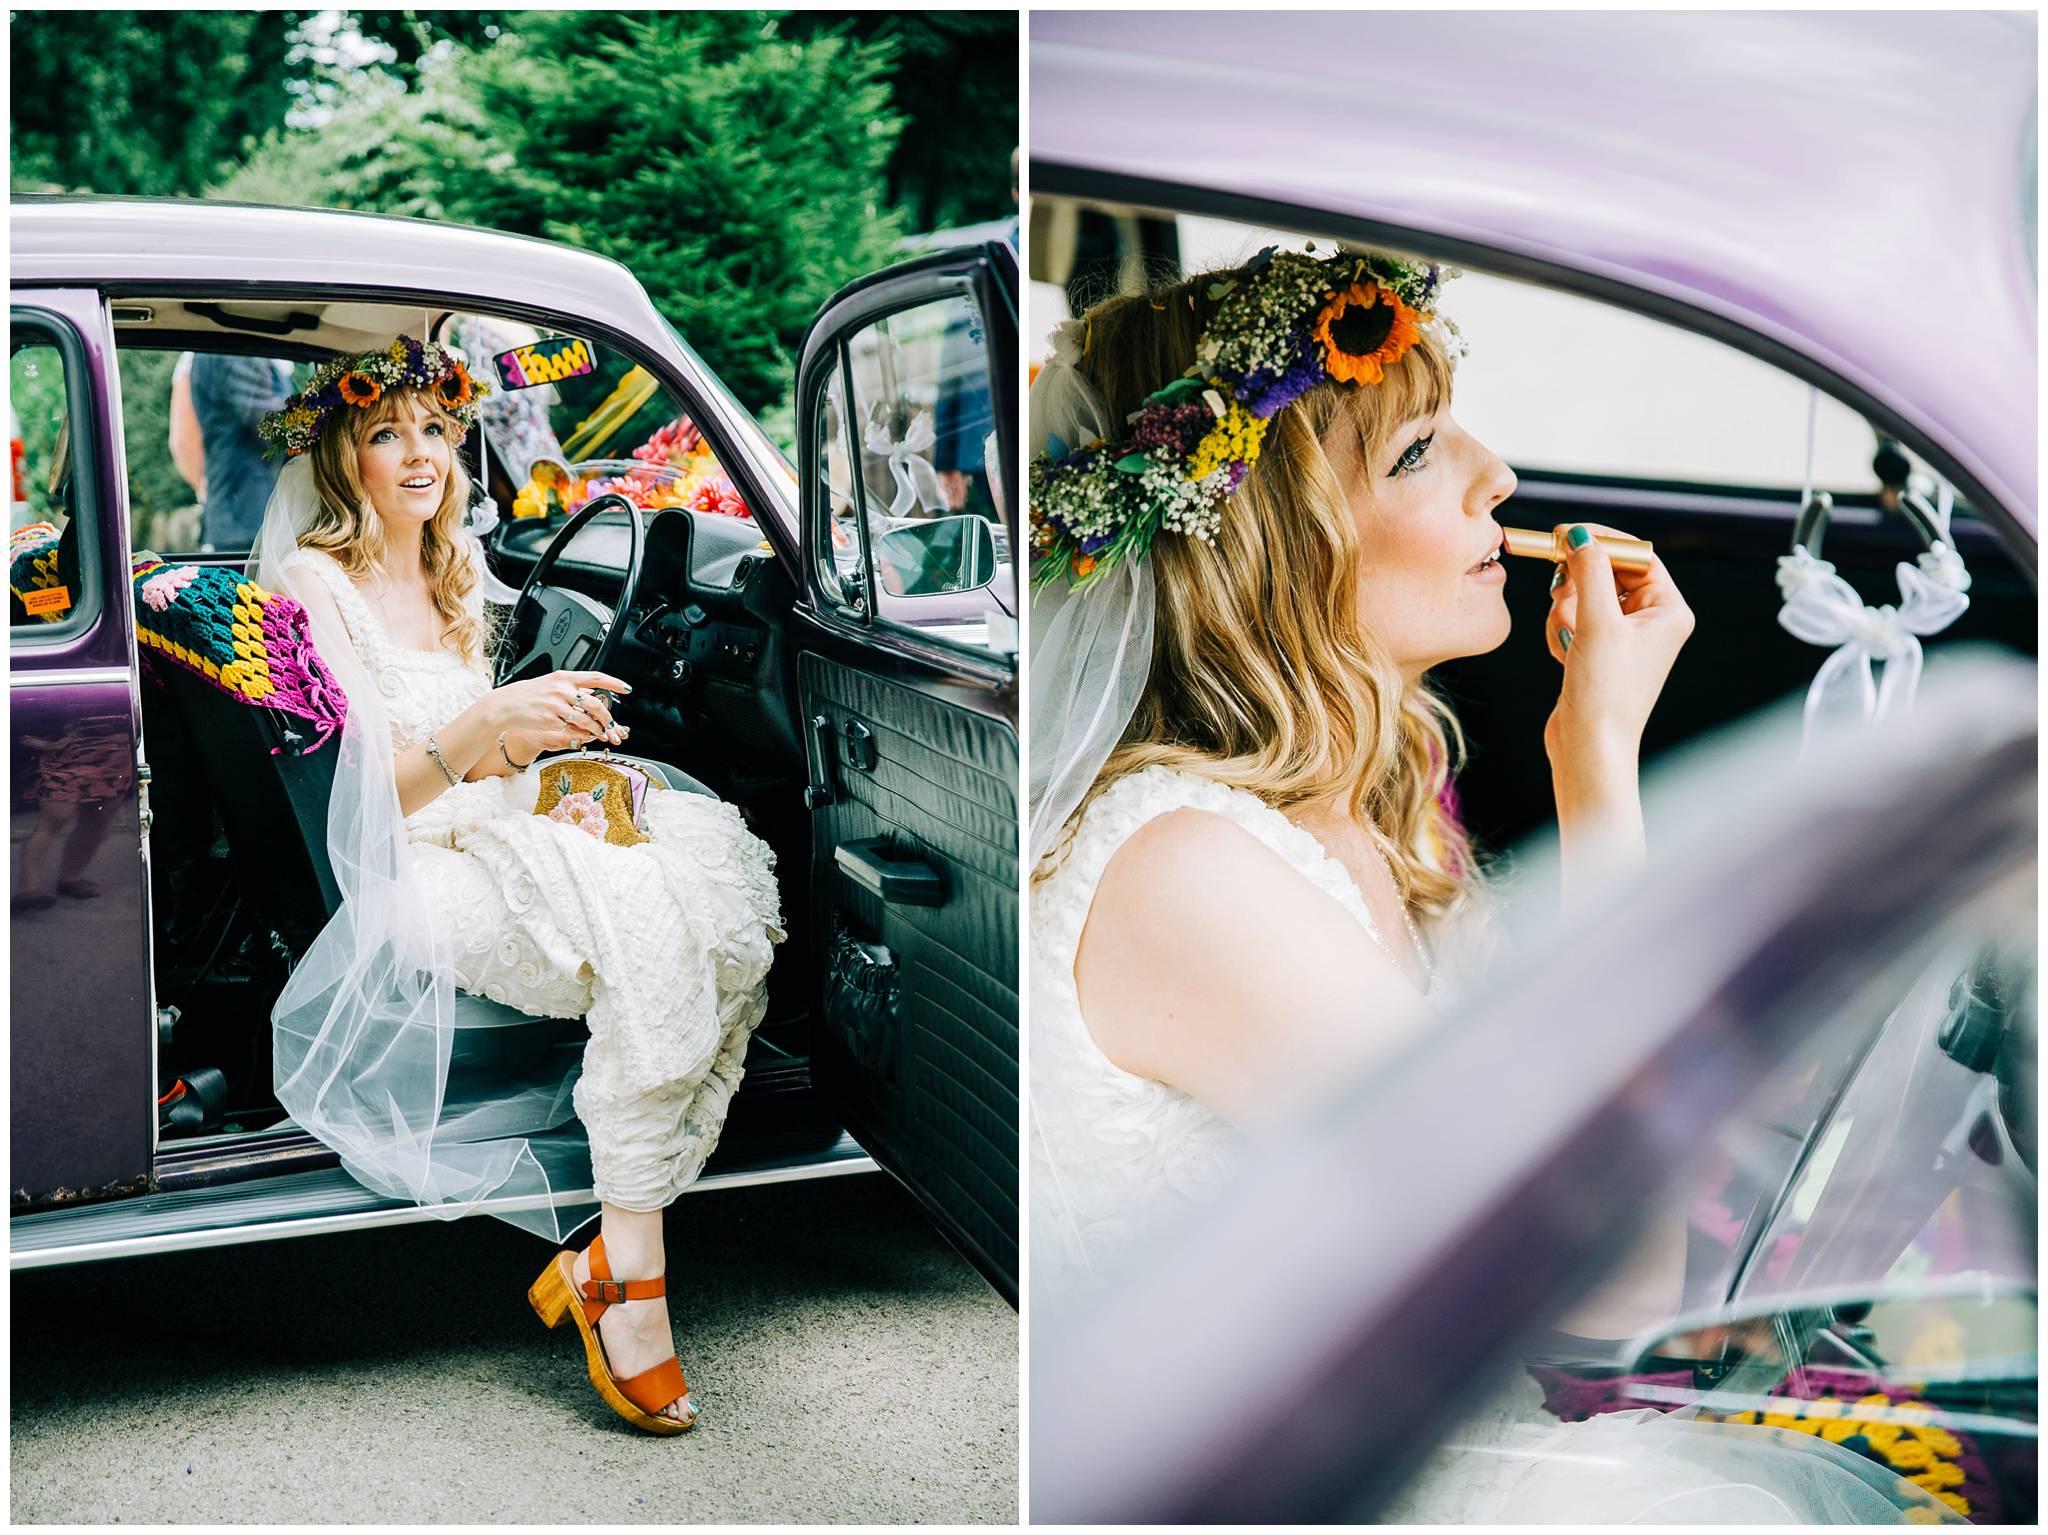 bride sat in front seat of VW beetle applying lipstick